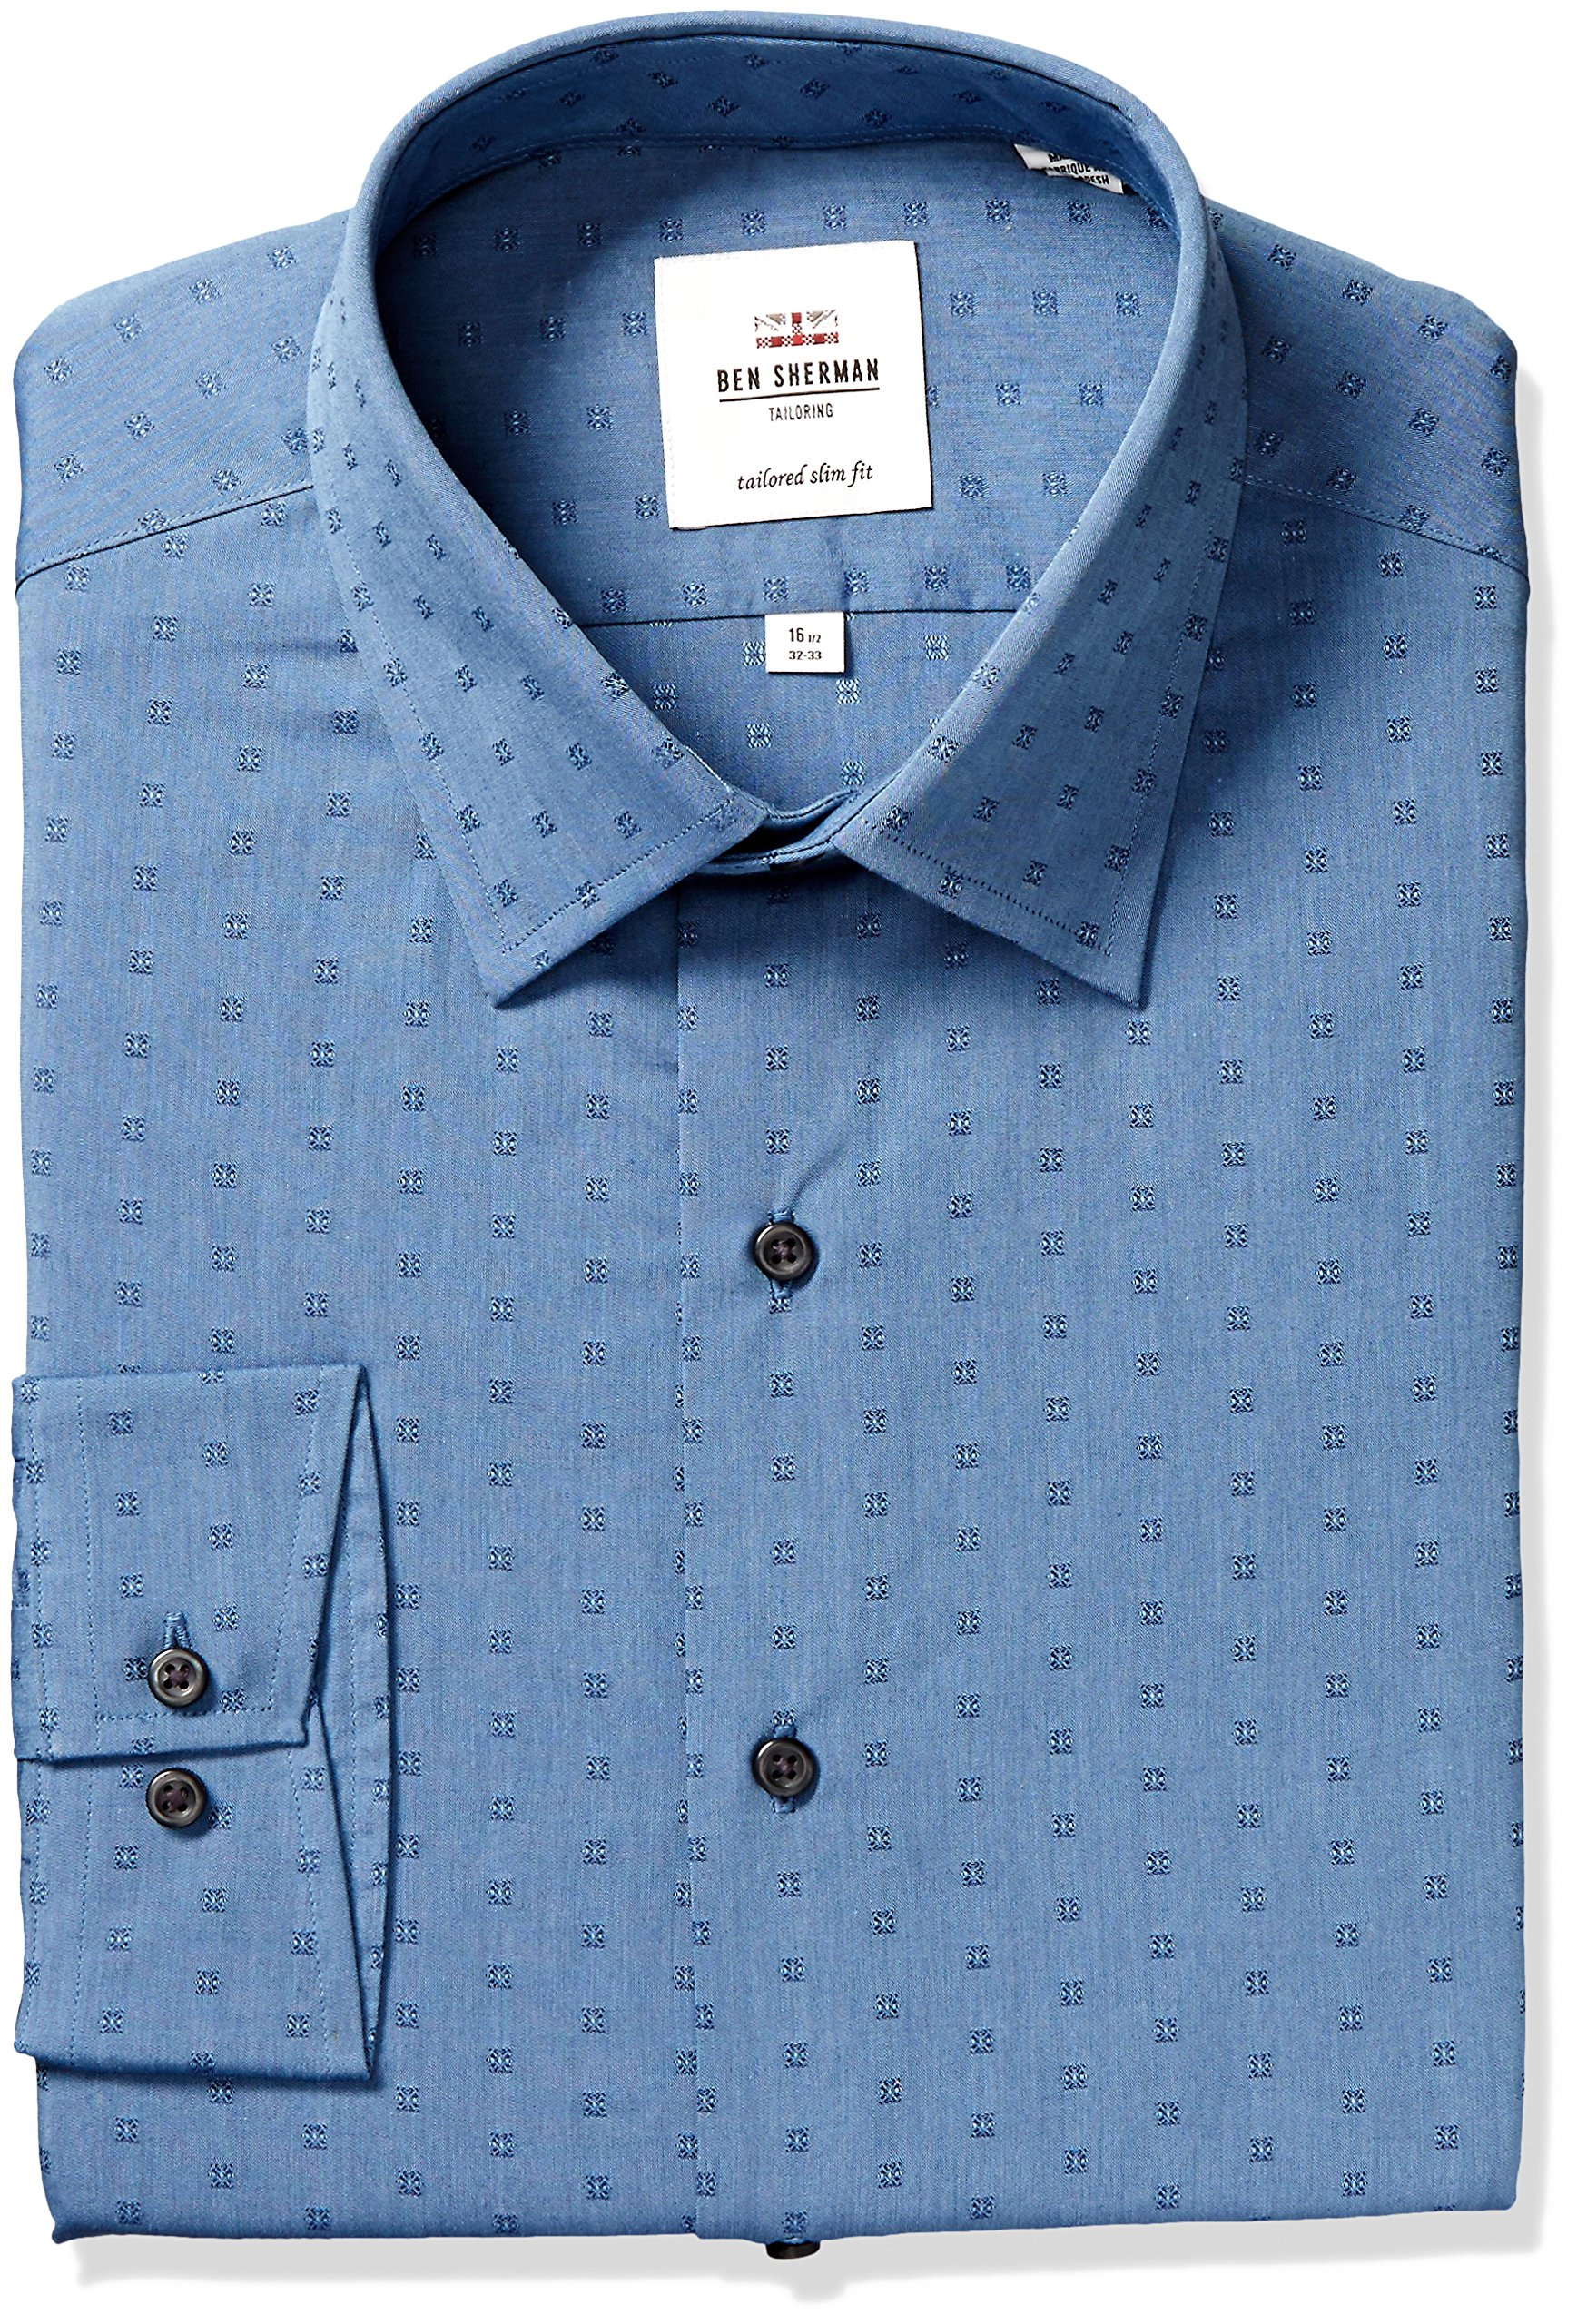 Ben Sherman Men's Slim Fit Foral Dobby Dress Shirt, Blue, 17'' Neck 34/35'' Sleeve